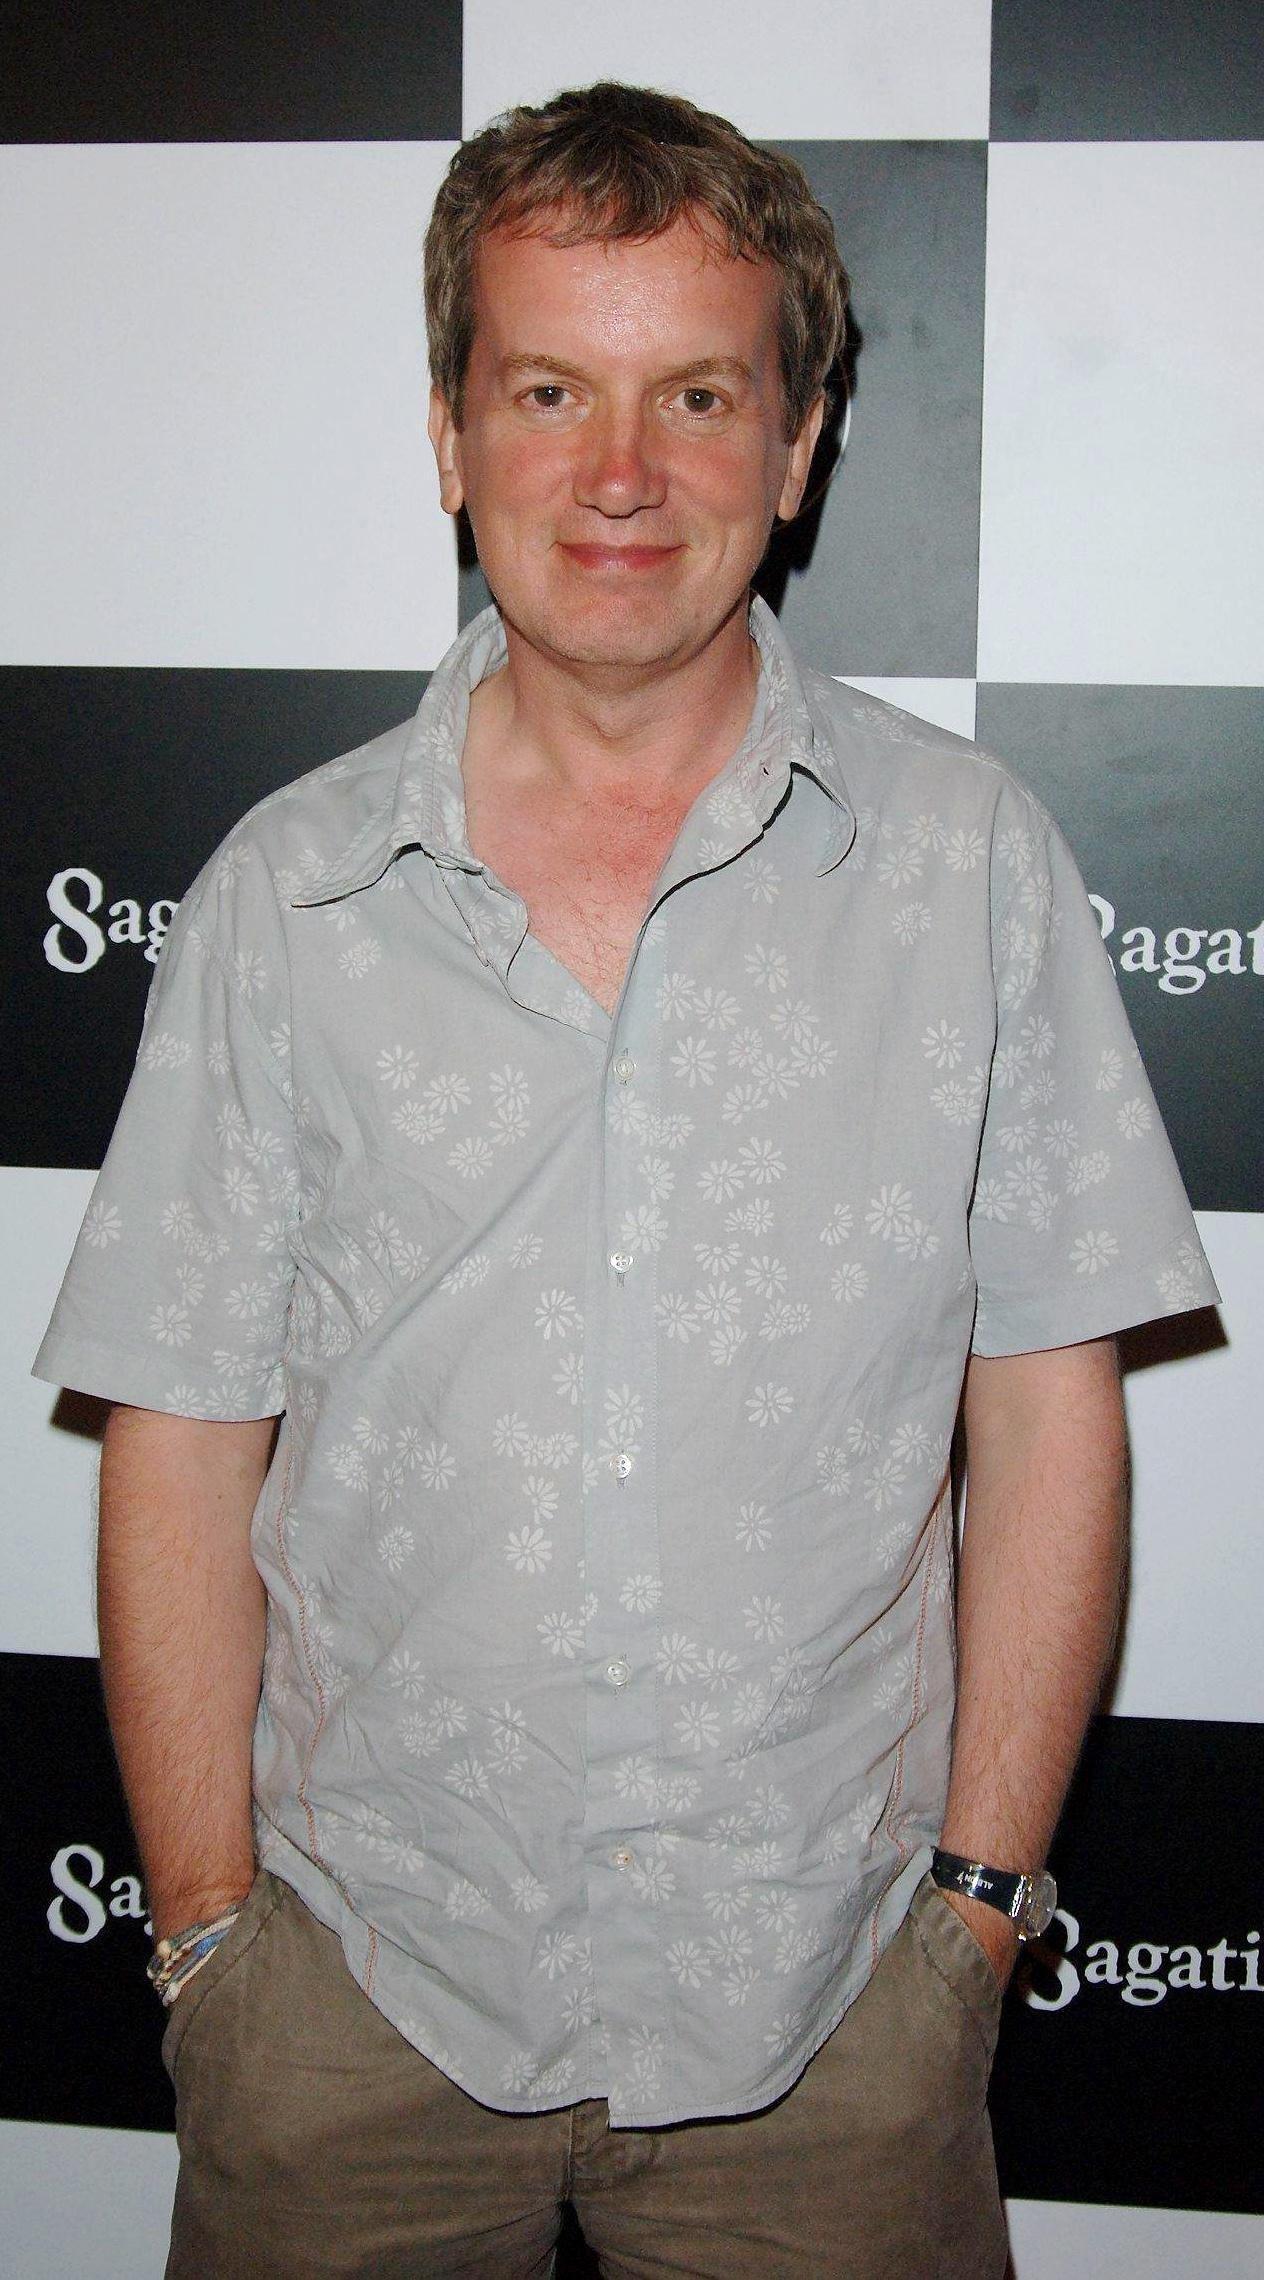 Comedian Skinner lost